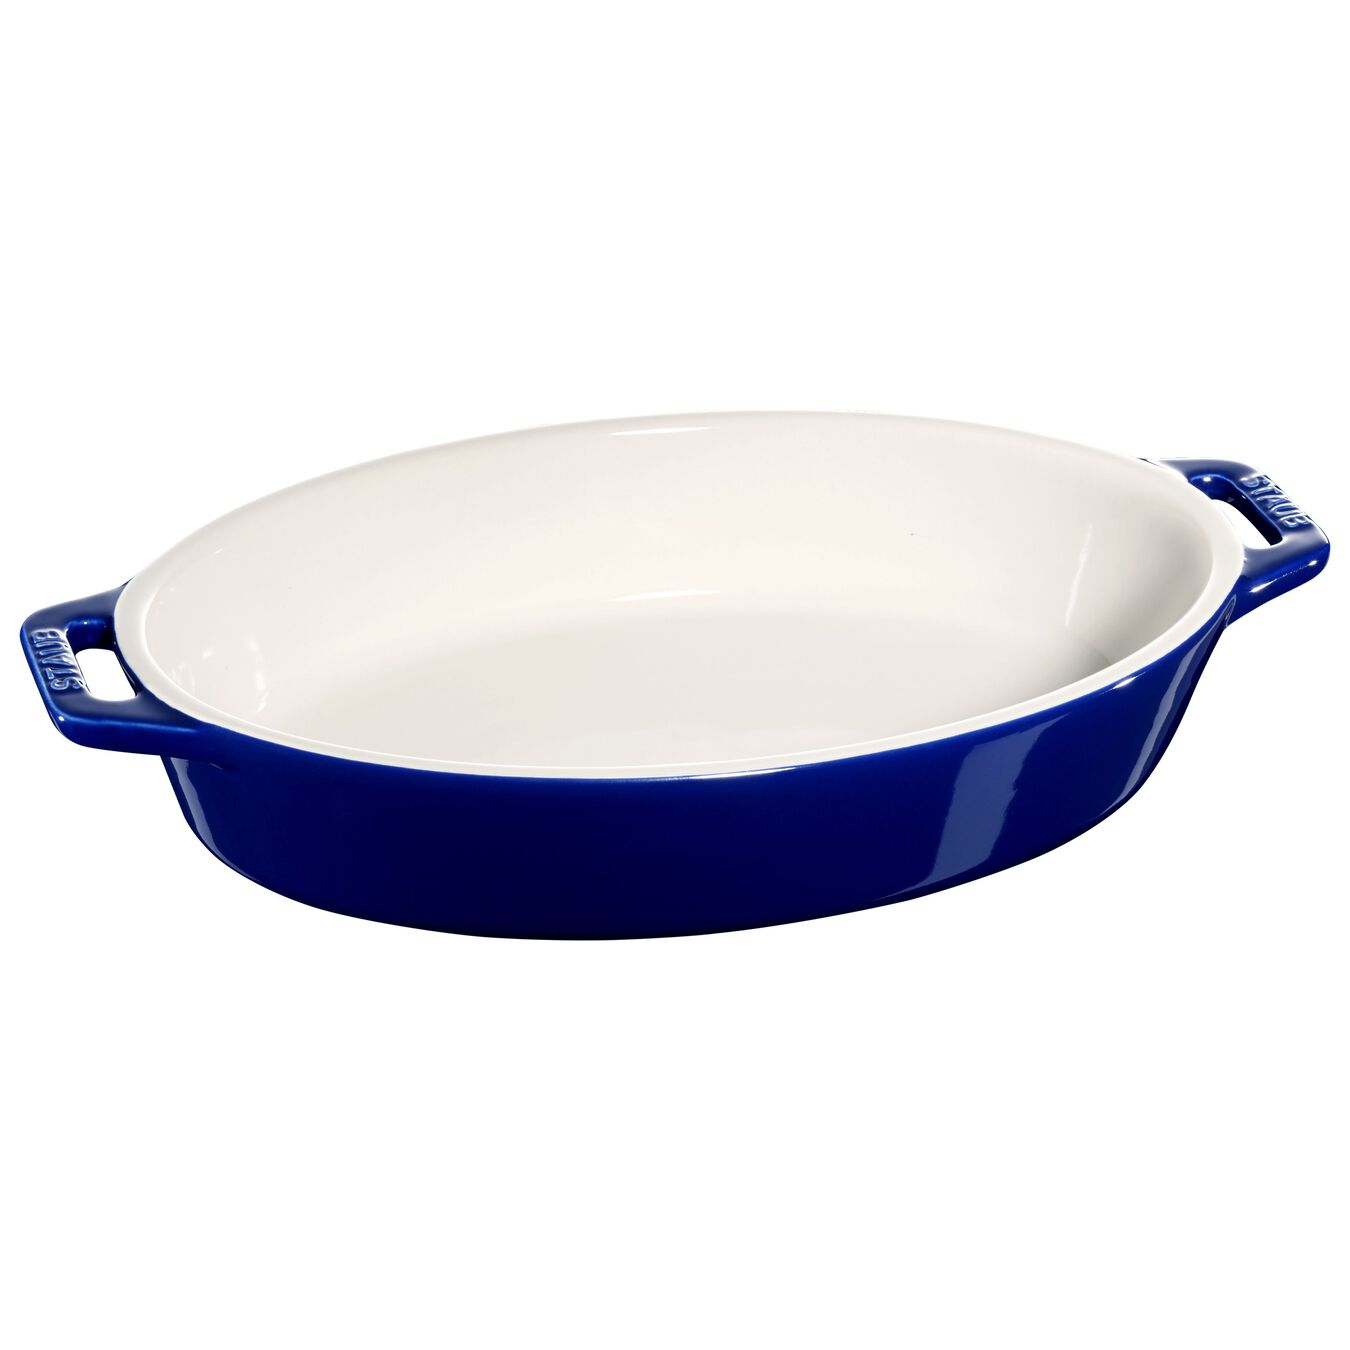 Ceramic oval Oven dish, Dark-Blue,,large 1